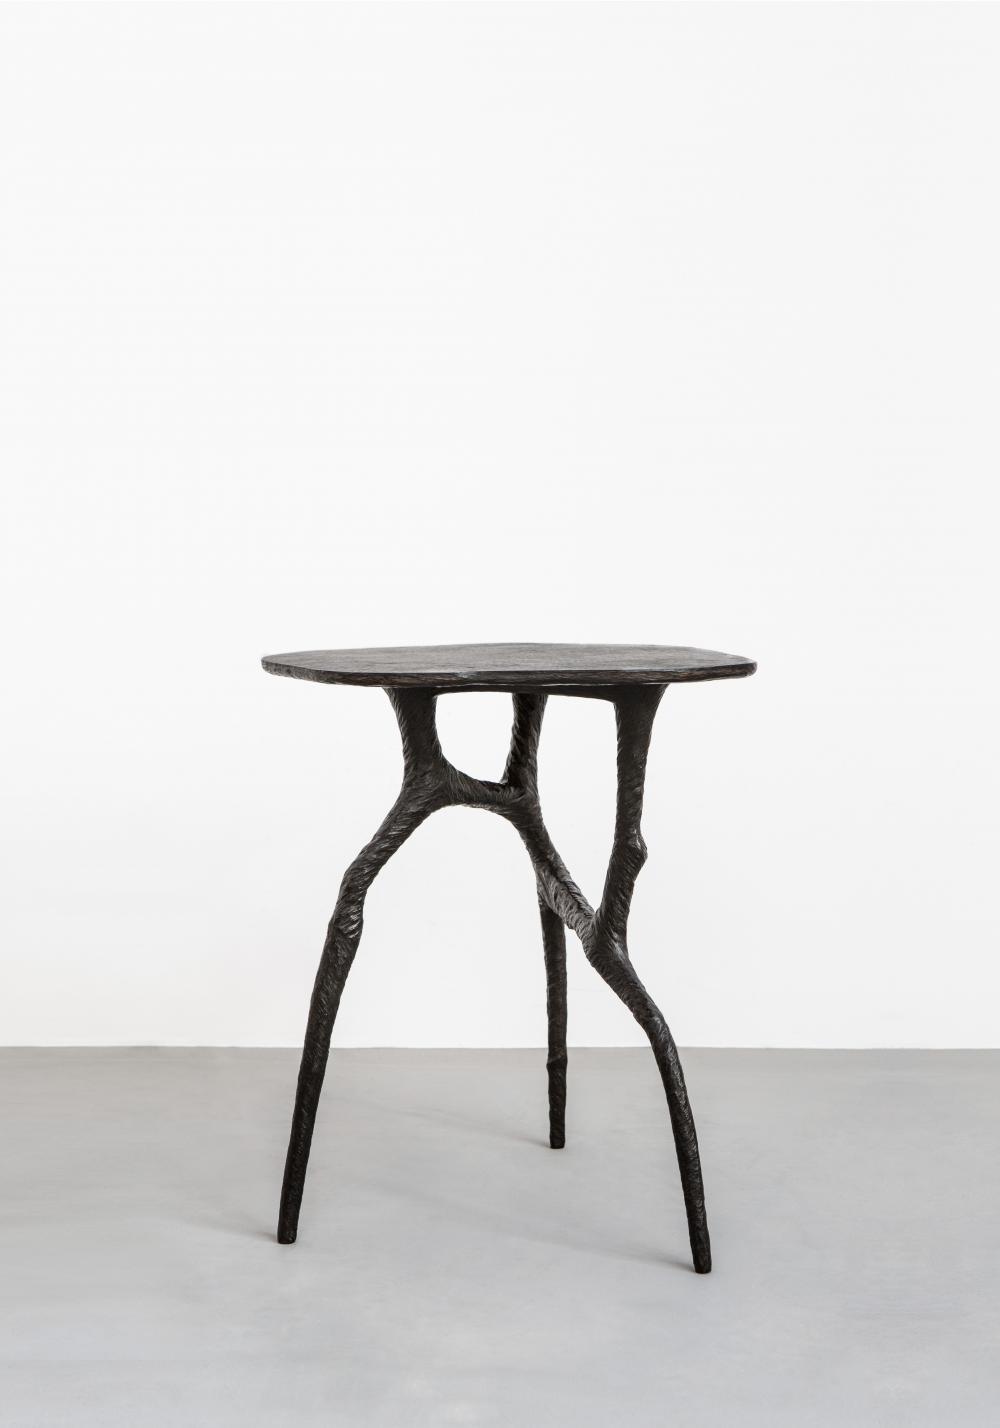 Art furniture The best Art furniture by Charles Trevelyan The best Art furniture by Charles Trevelyan I Lobo you14